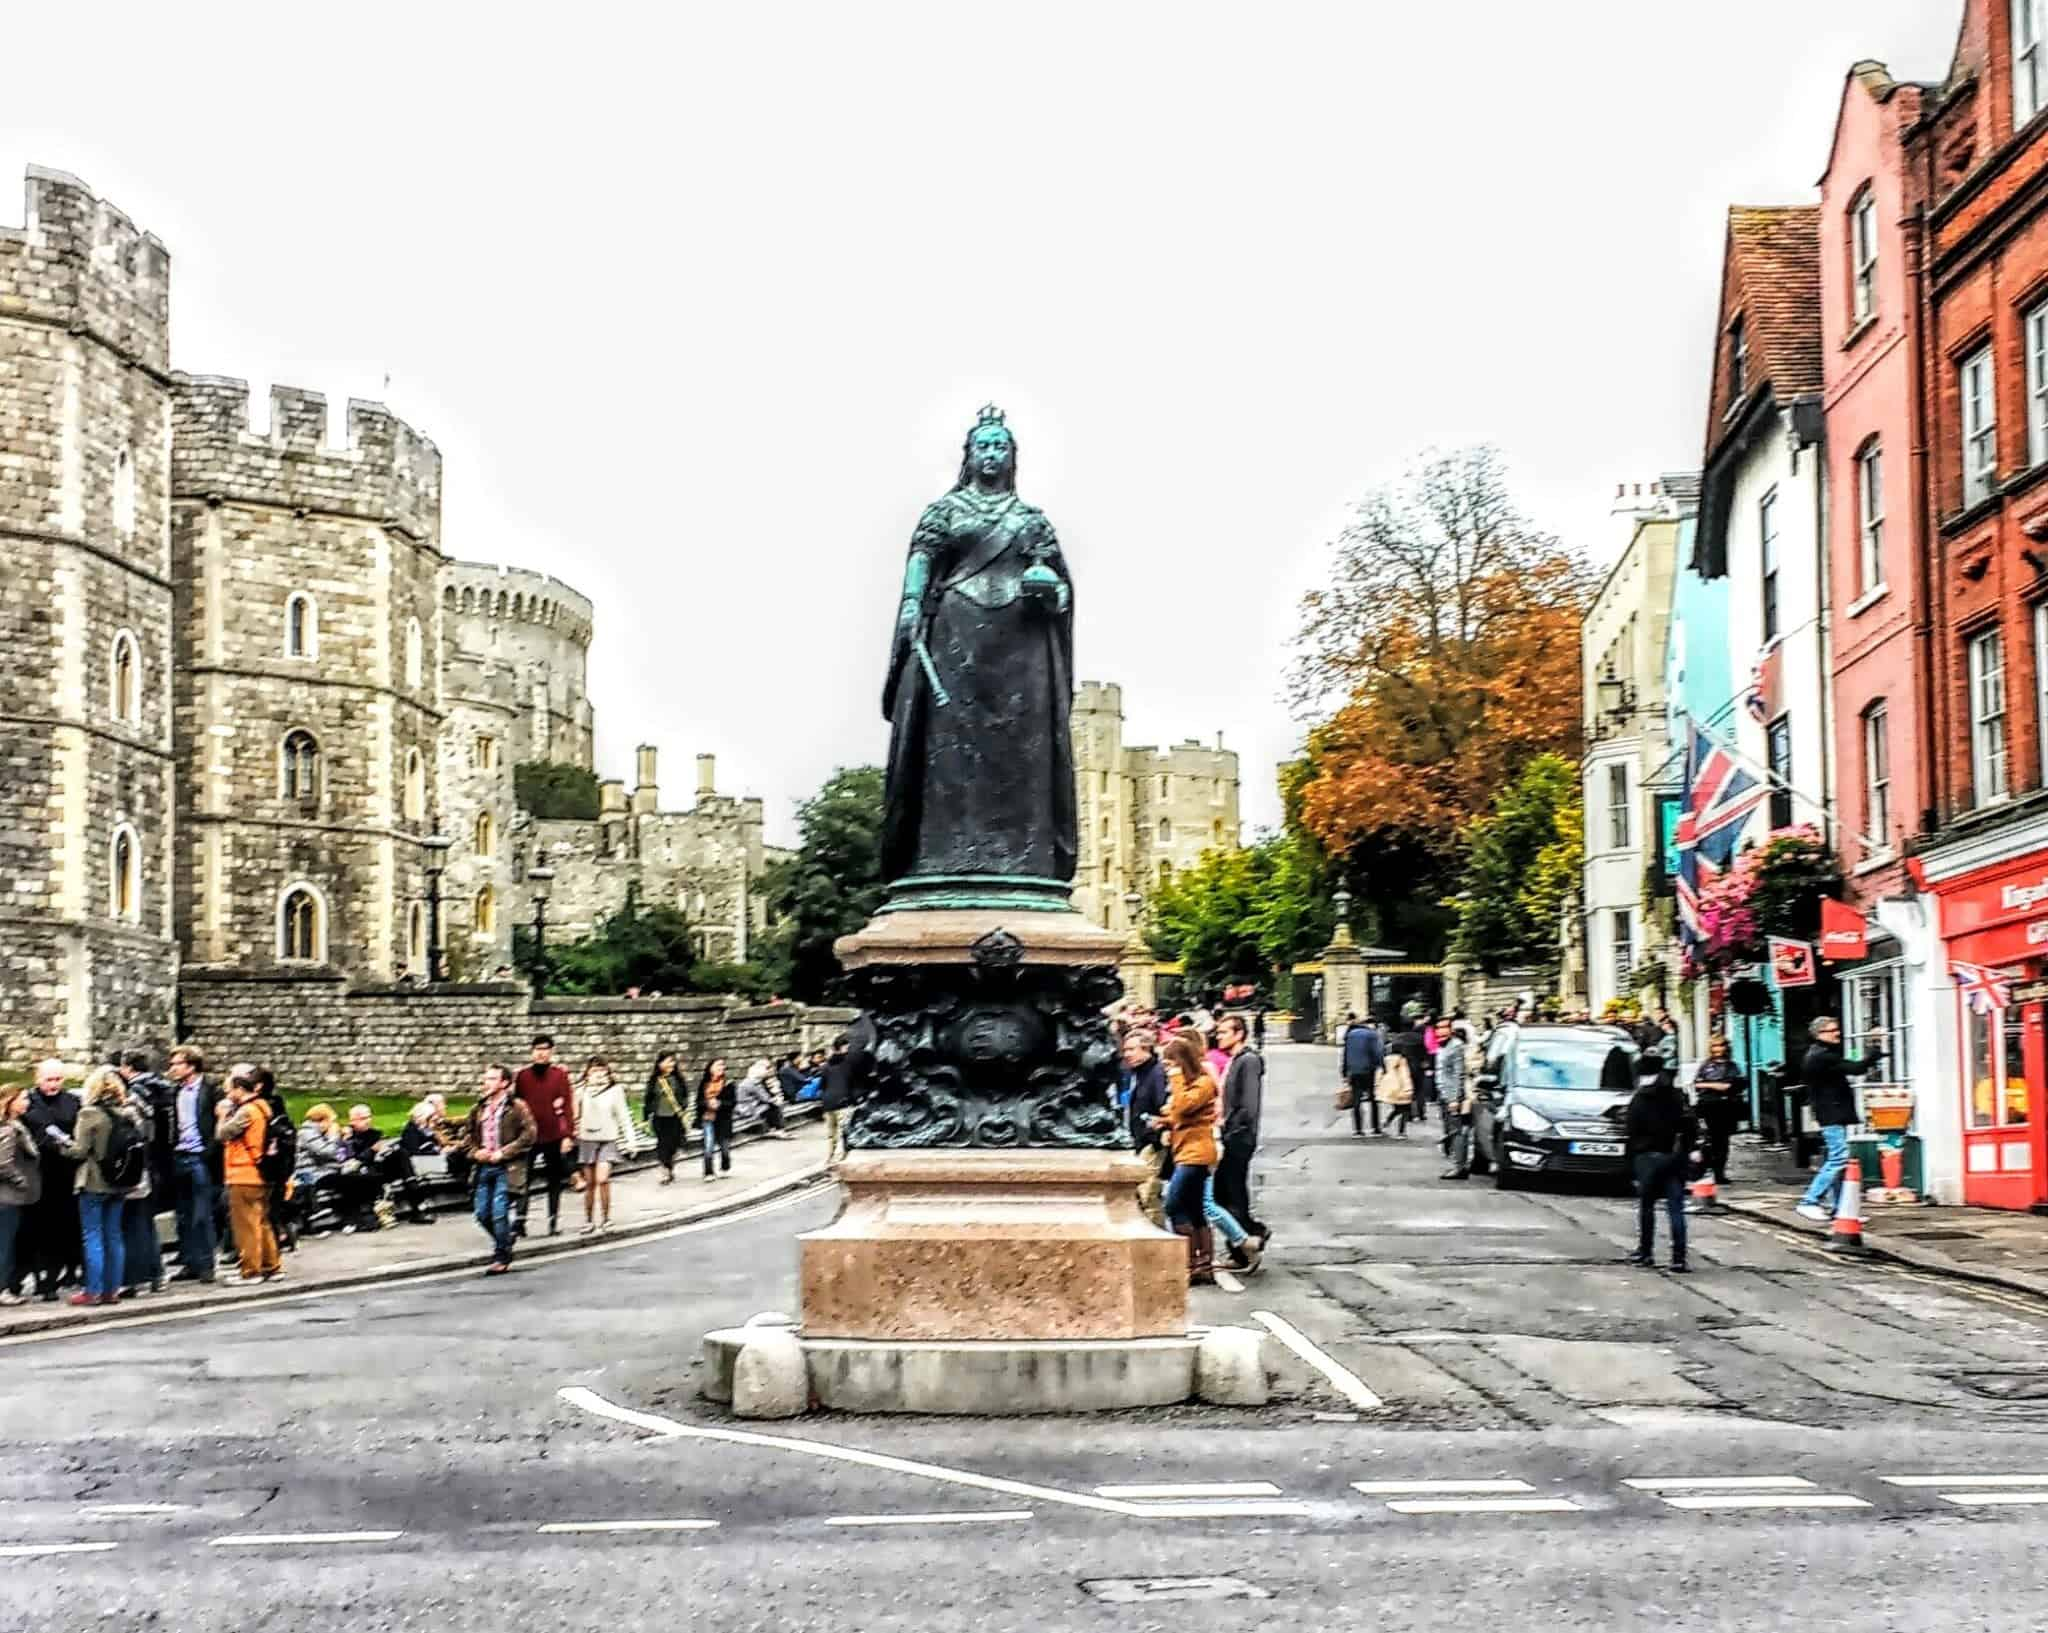 Queen Victoria's statue that sits in Windsor